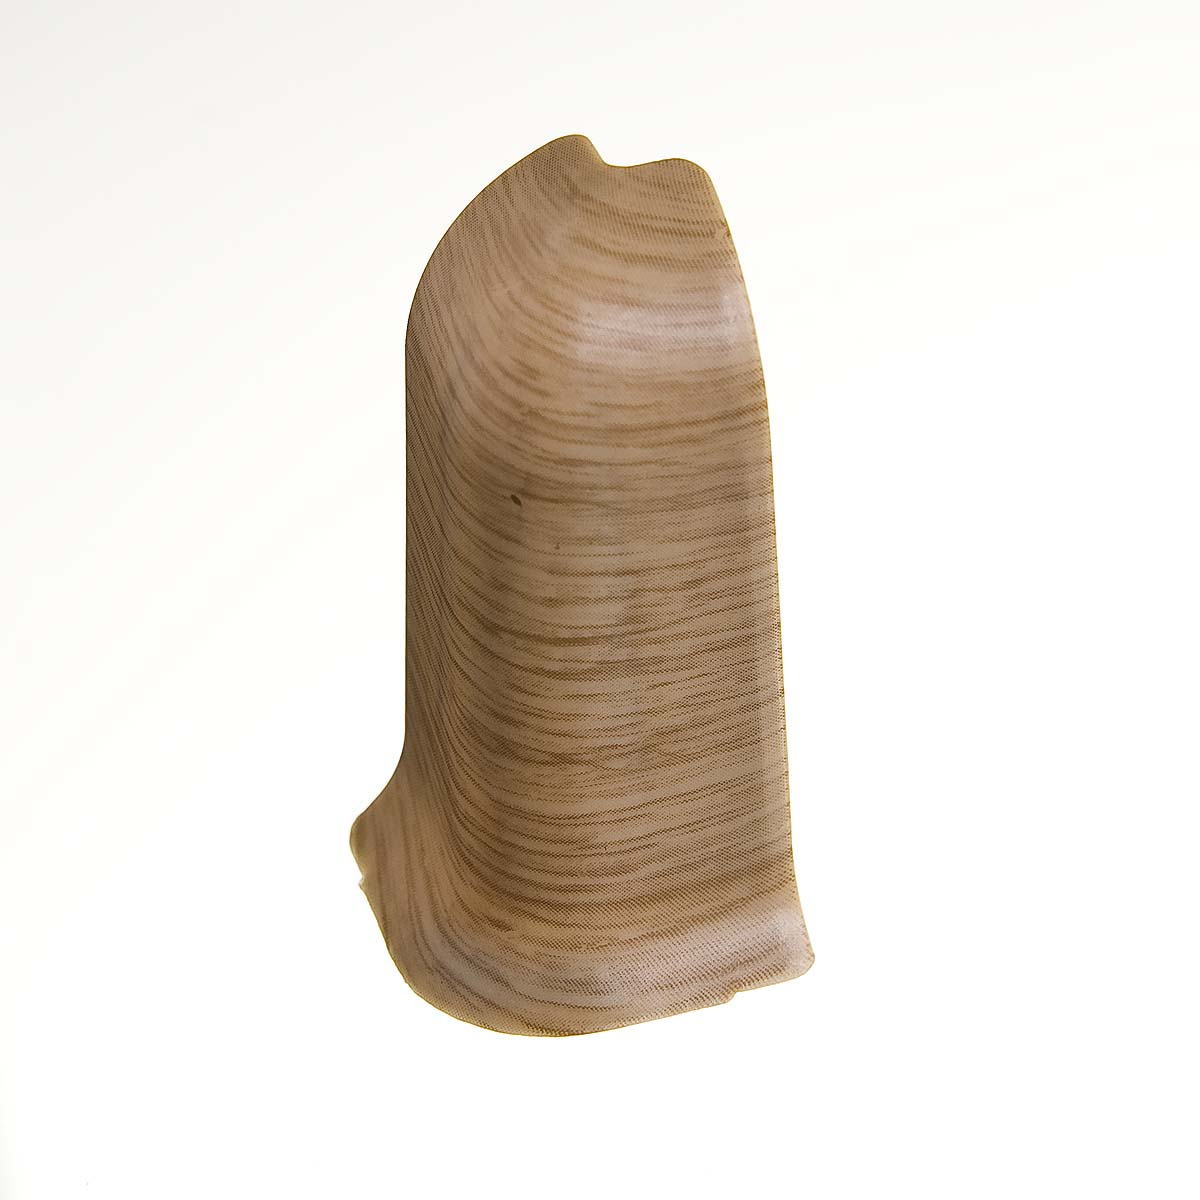 Угол наружный к плинтусу 68 мм дуб натуральный Nexus